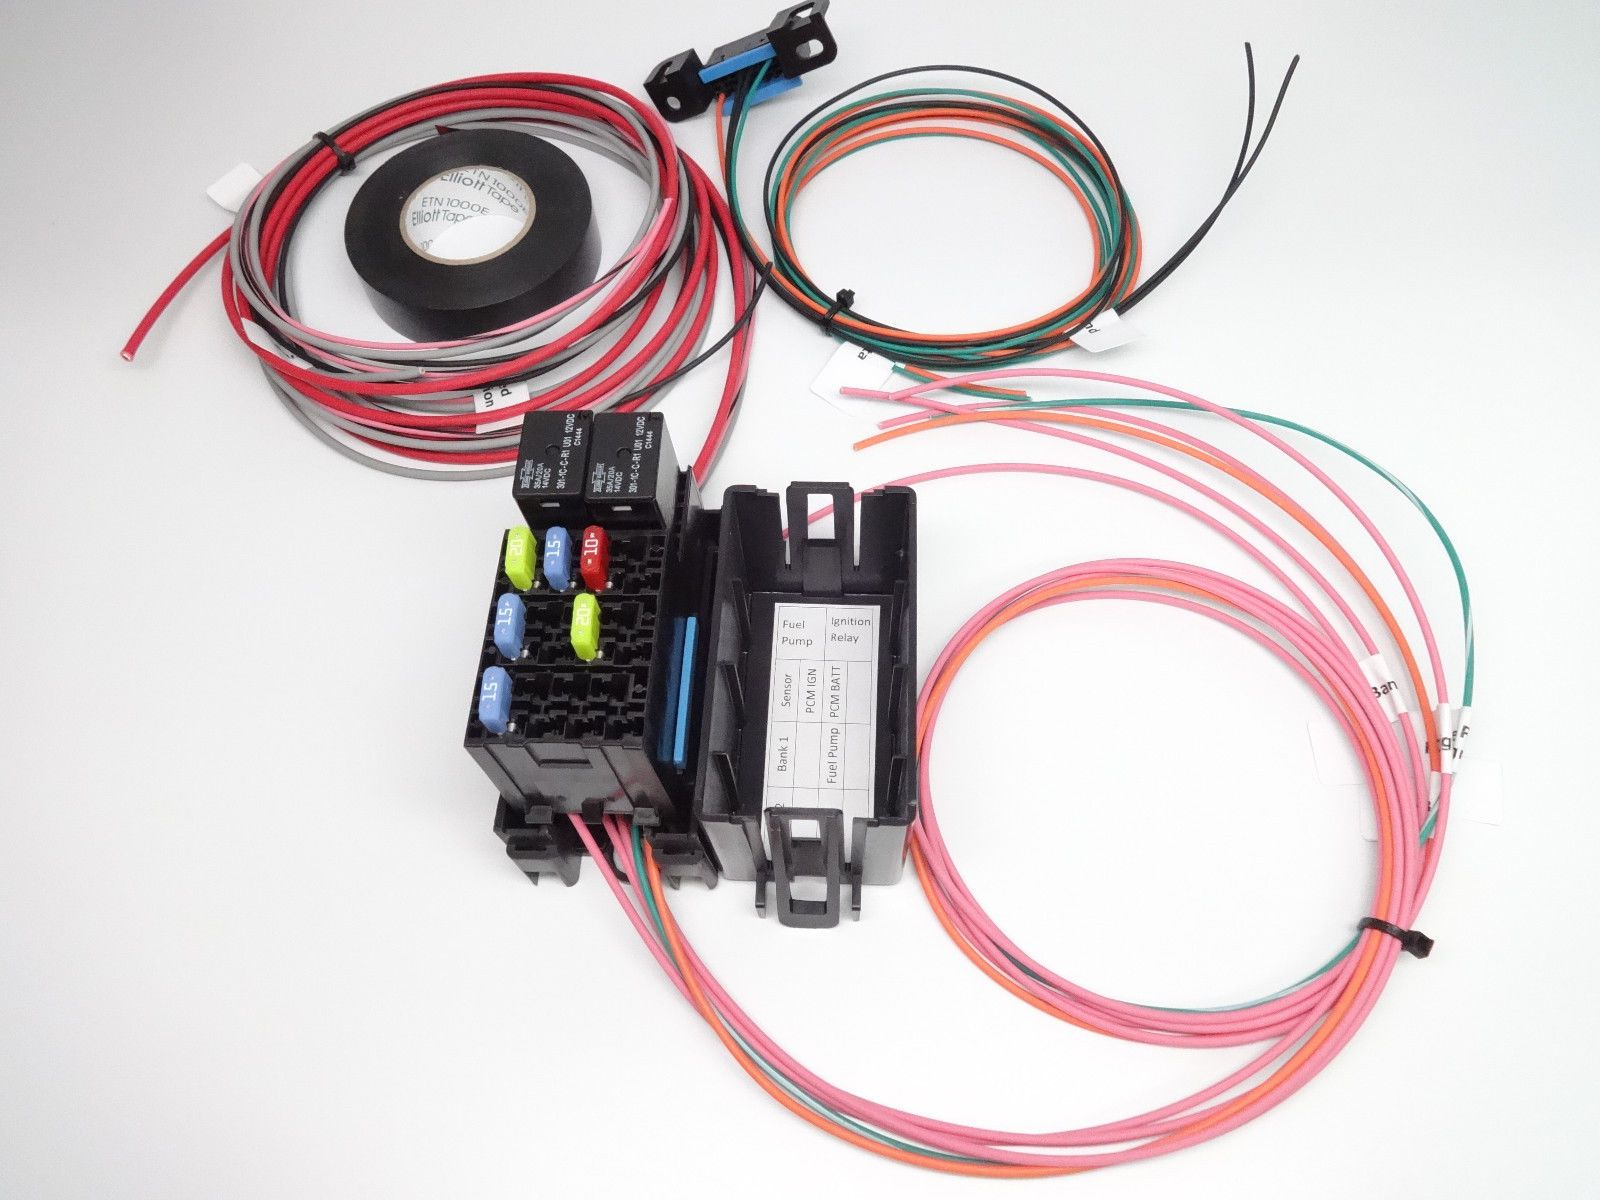 small resolution of ls1 fuse box pins wiring library rh 73 codingcommunity de fuse profire sight fuse pin pylon